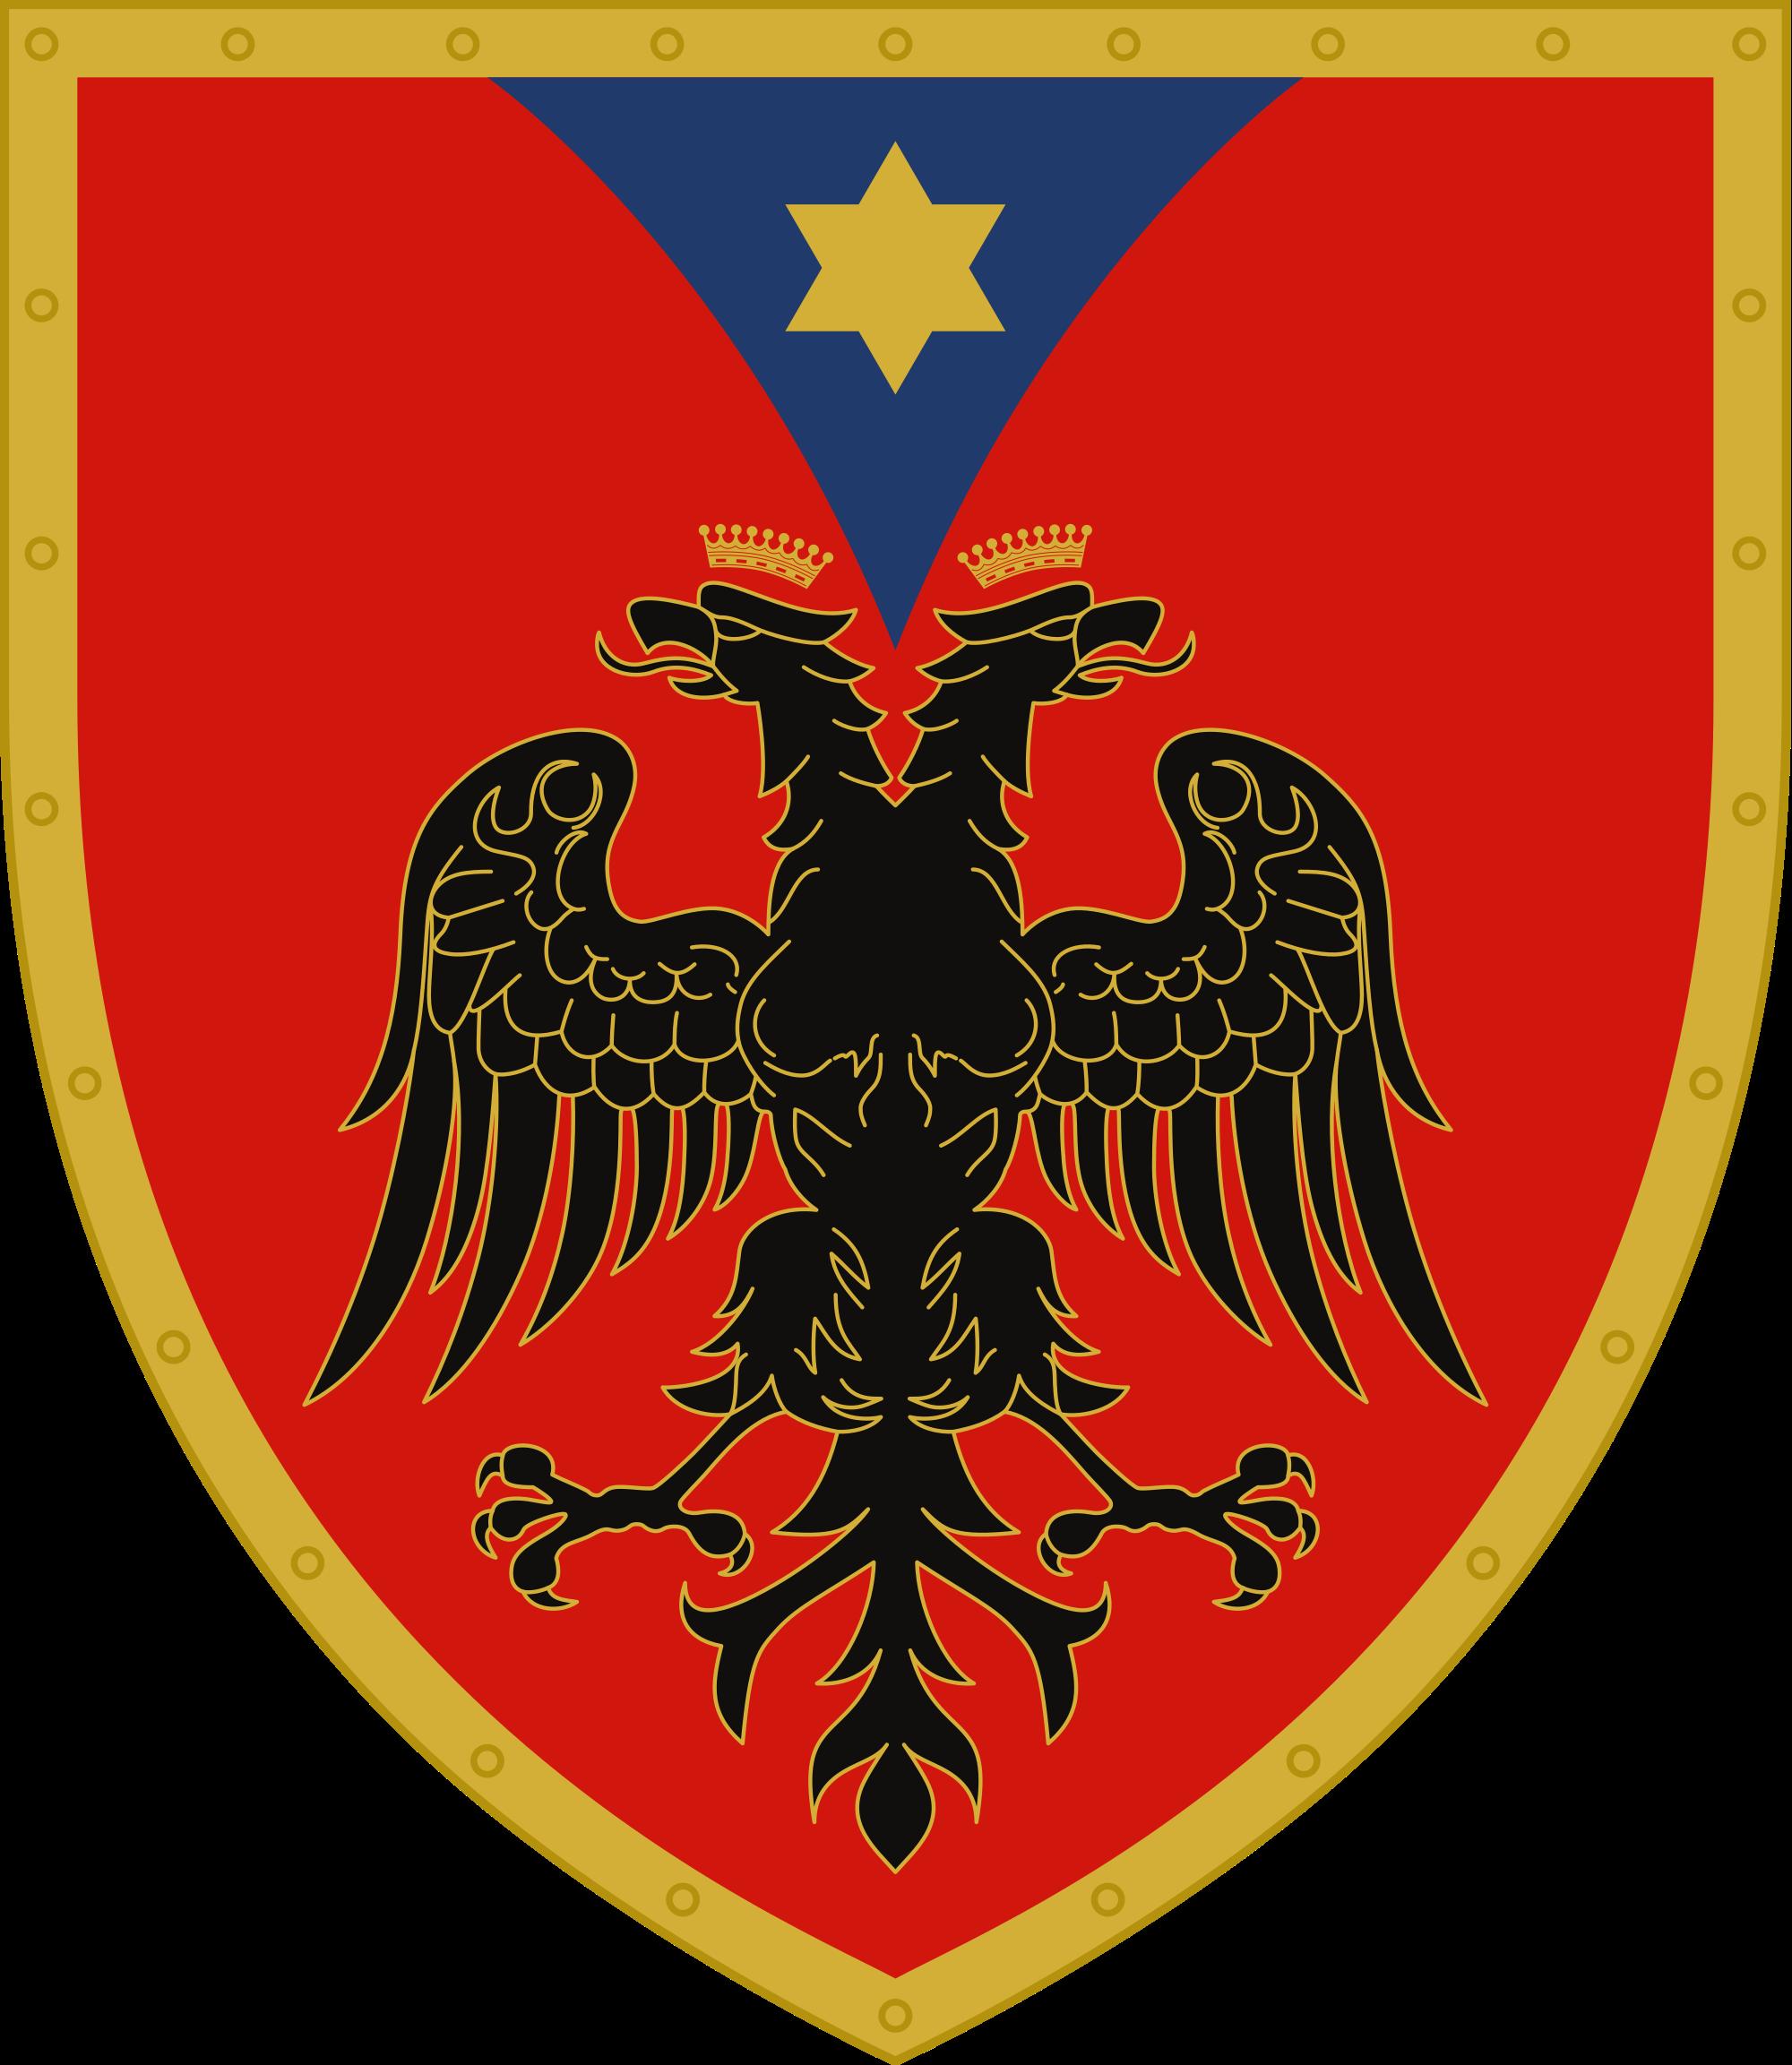 Et Drapeau Ses AlbanieLe AlbanaisL'aigle Spécial Dossier 8NZn0wkPOX